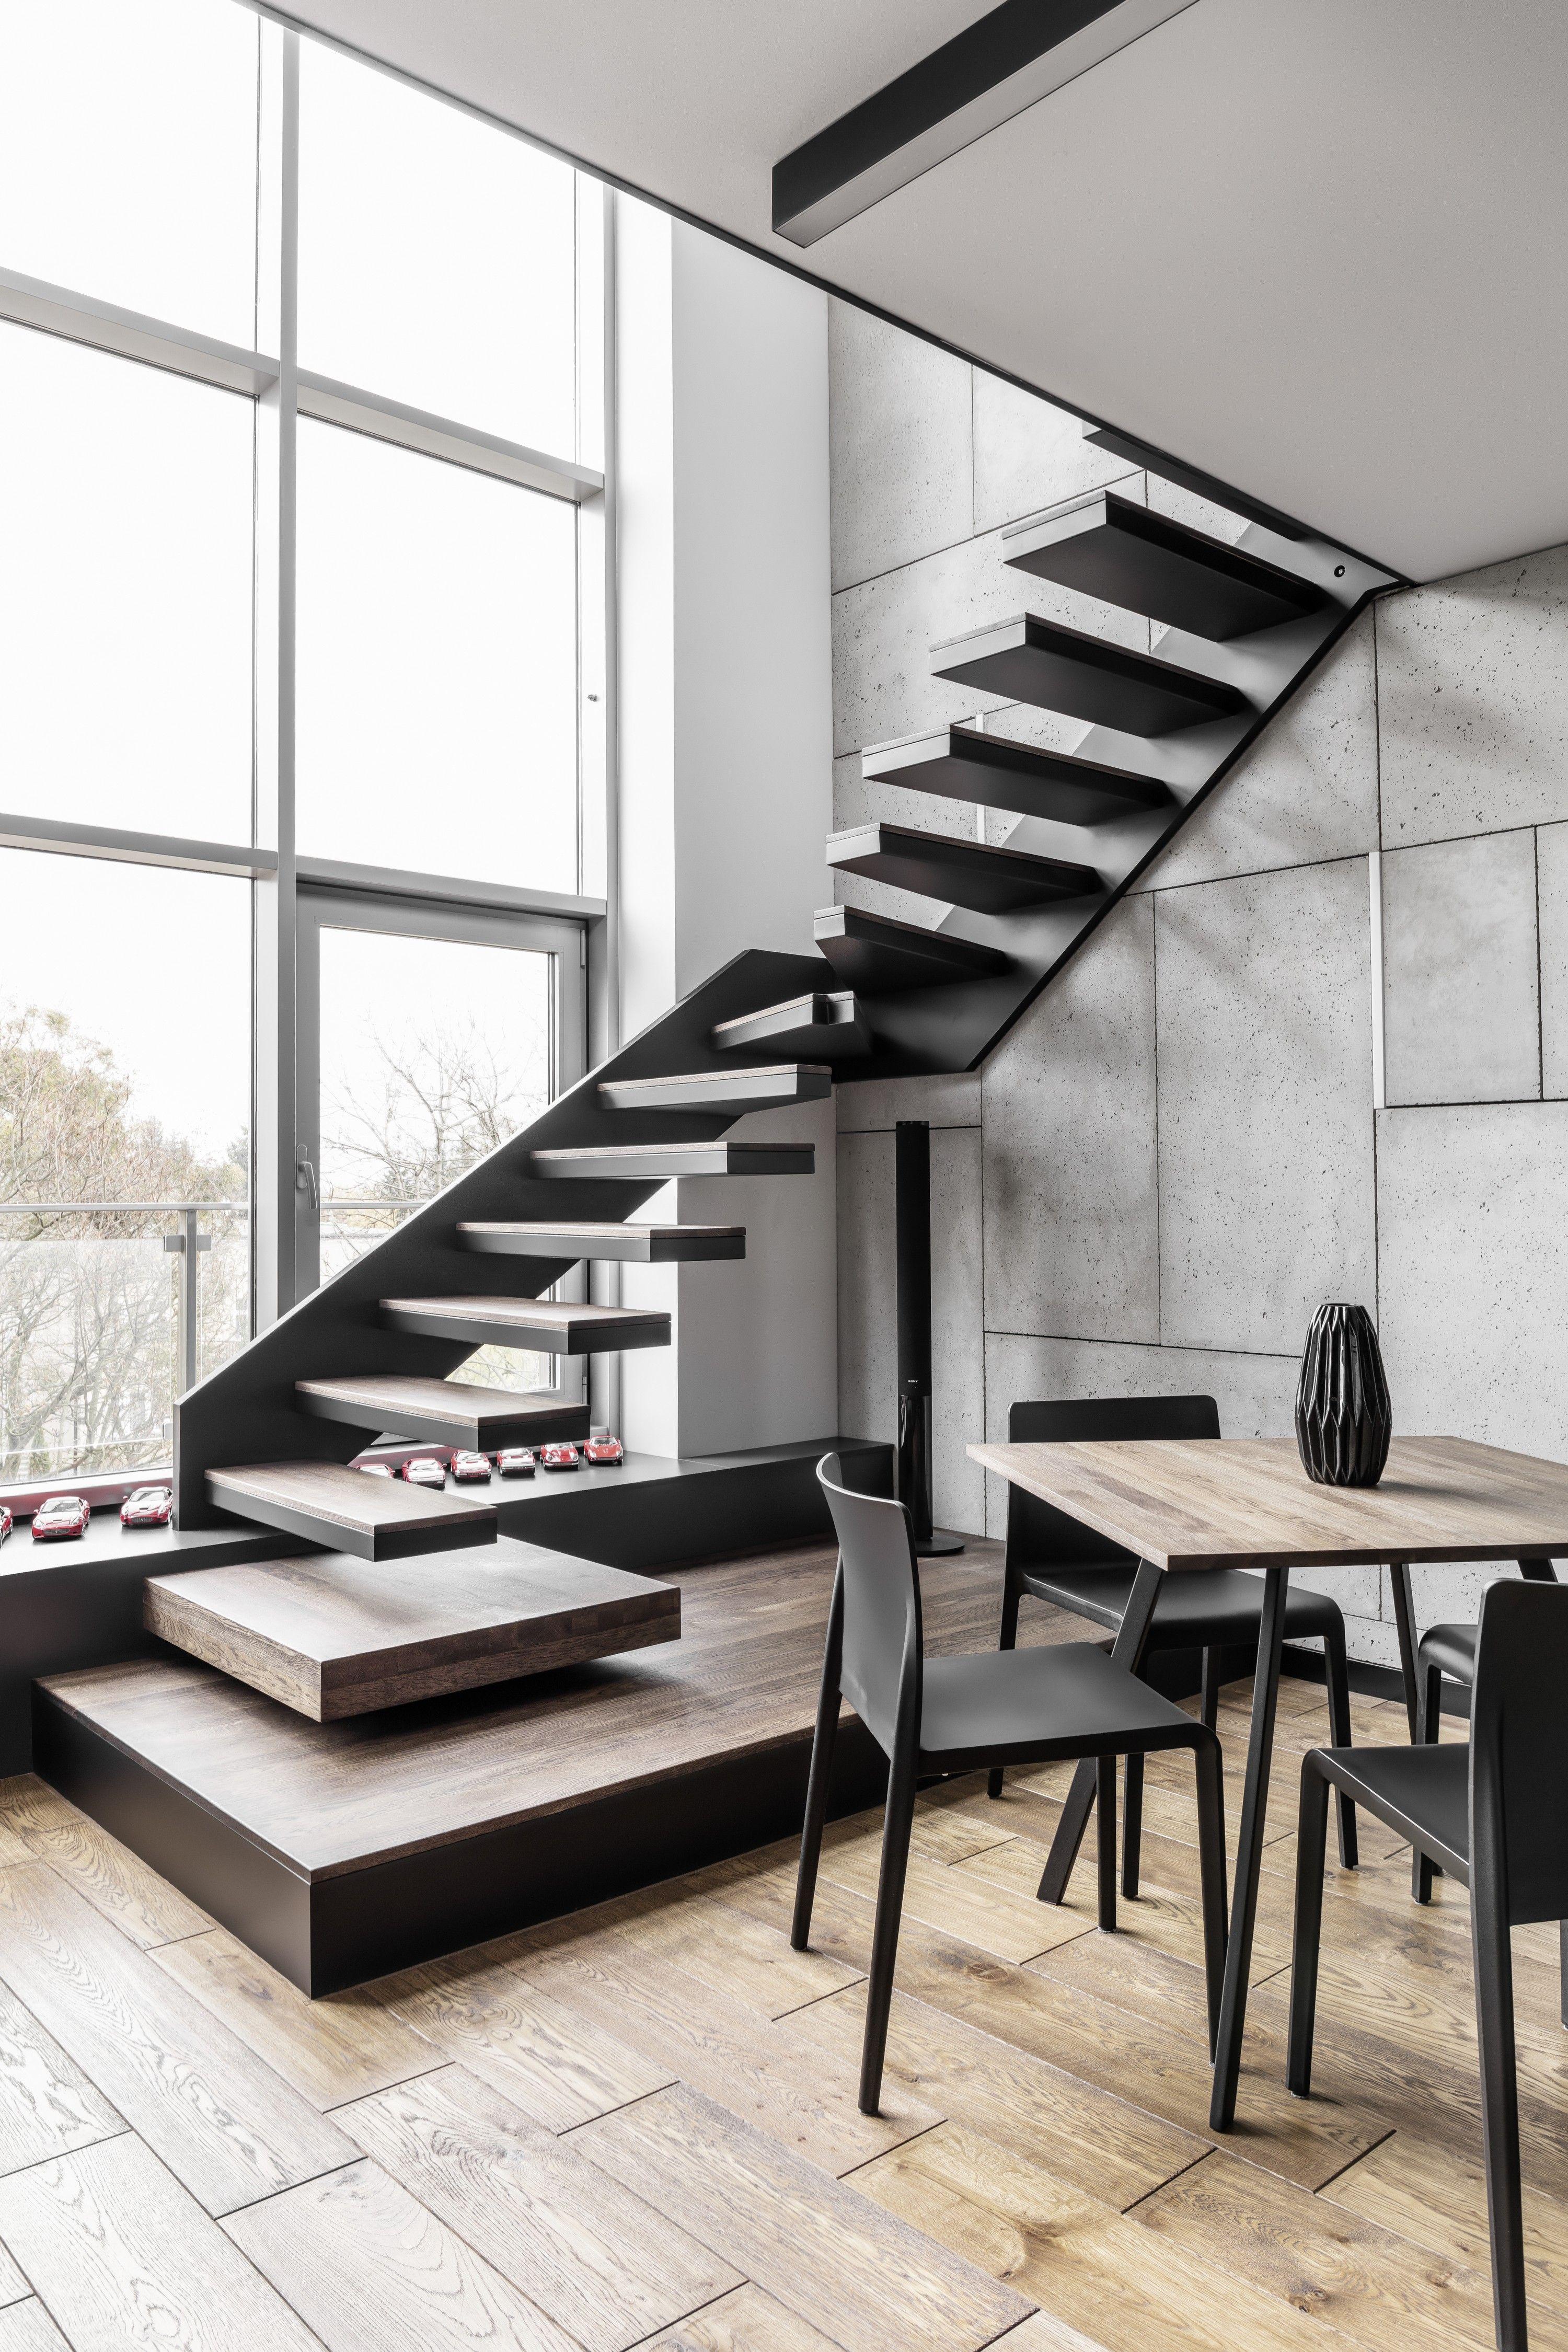 Archello   Apartment design, Stairs design, Staircase decor